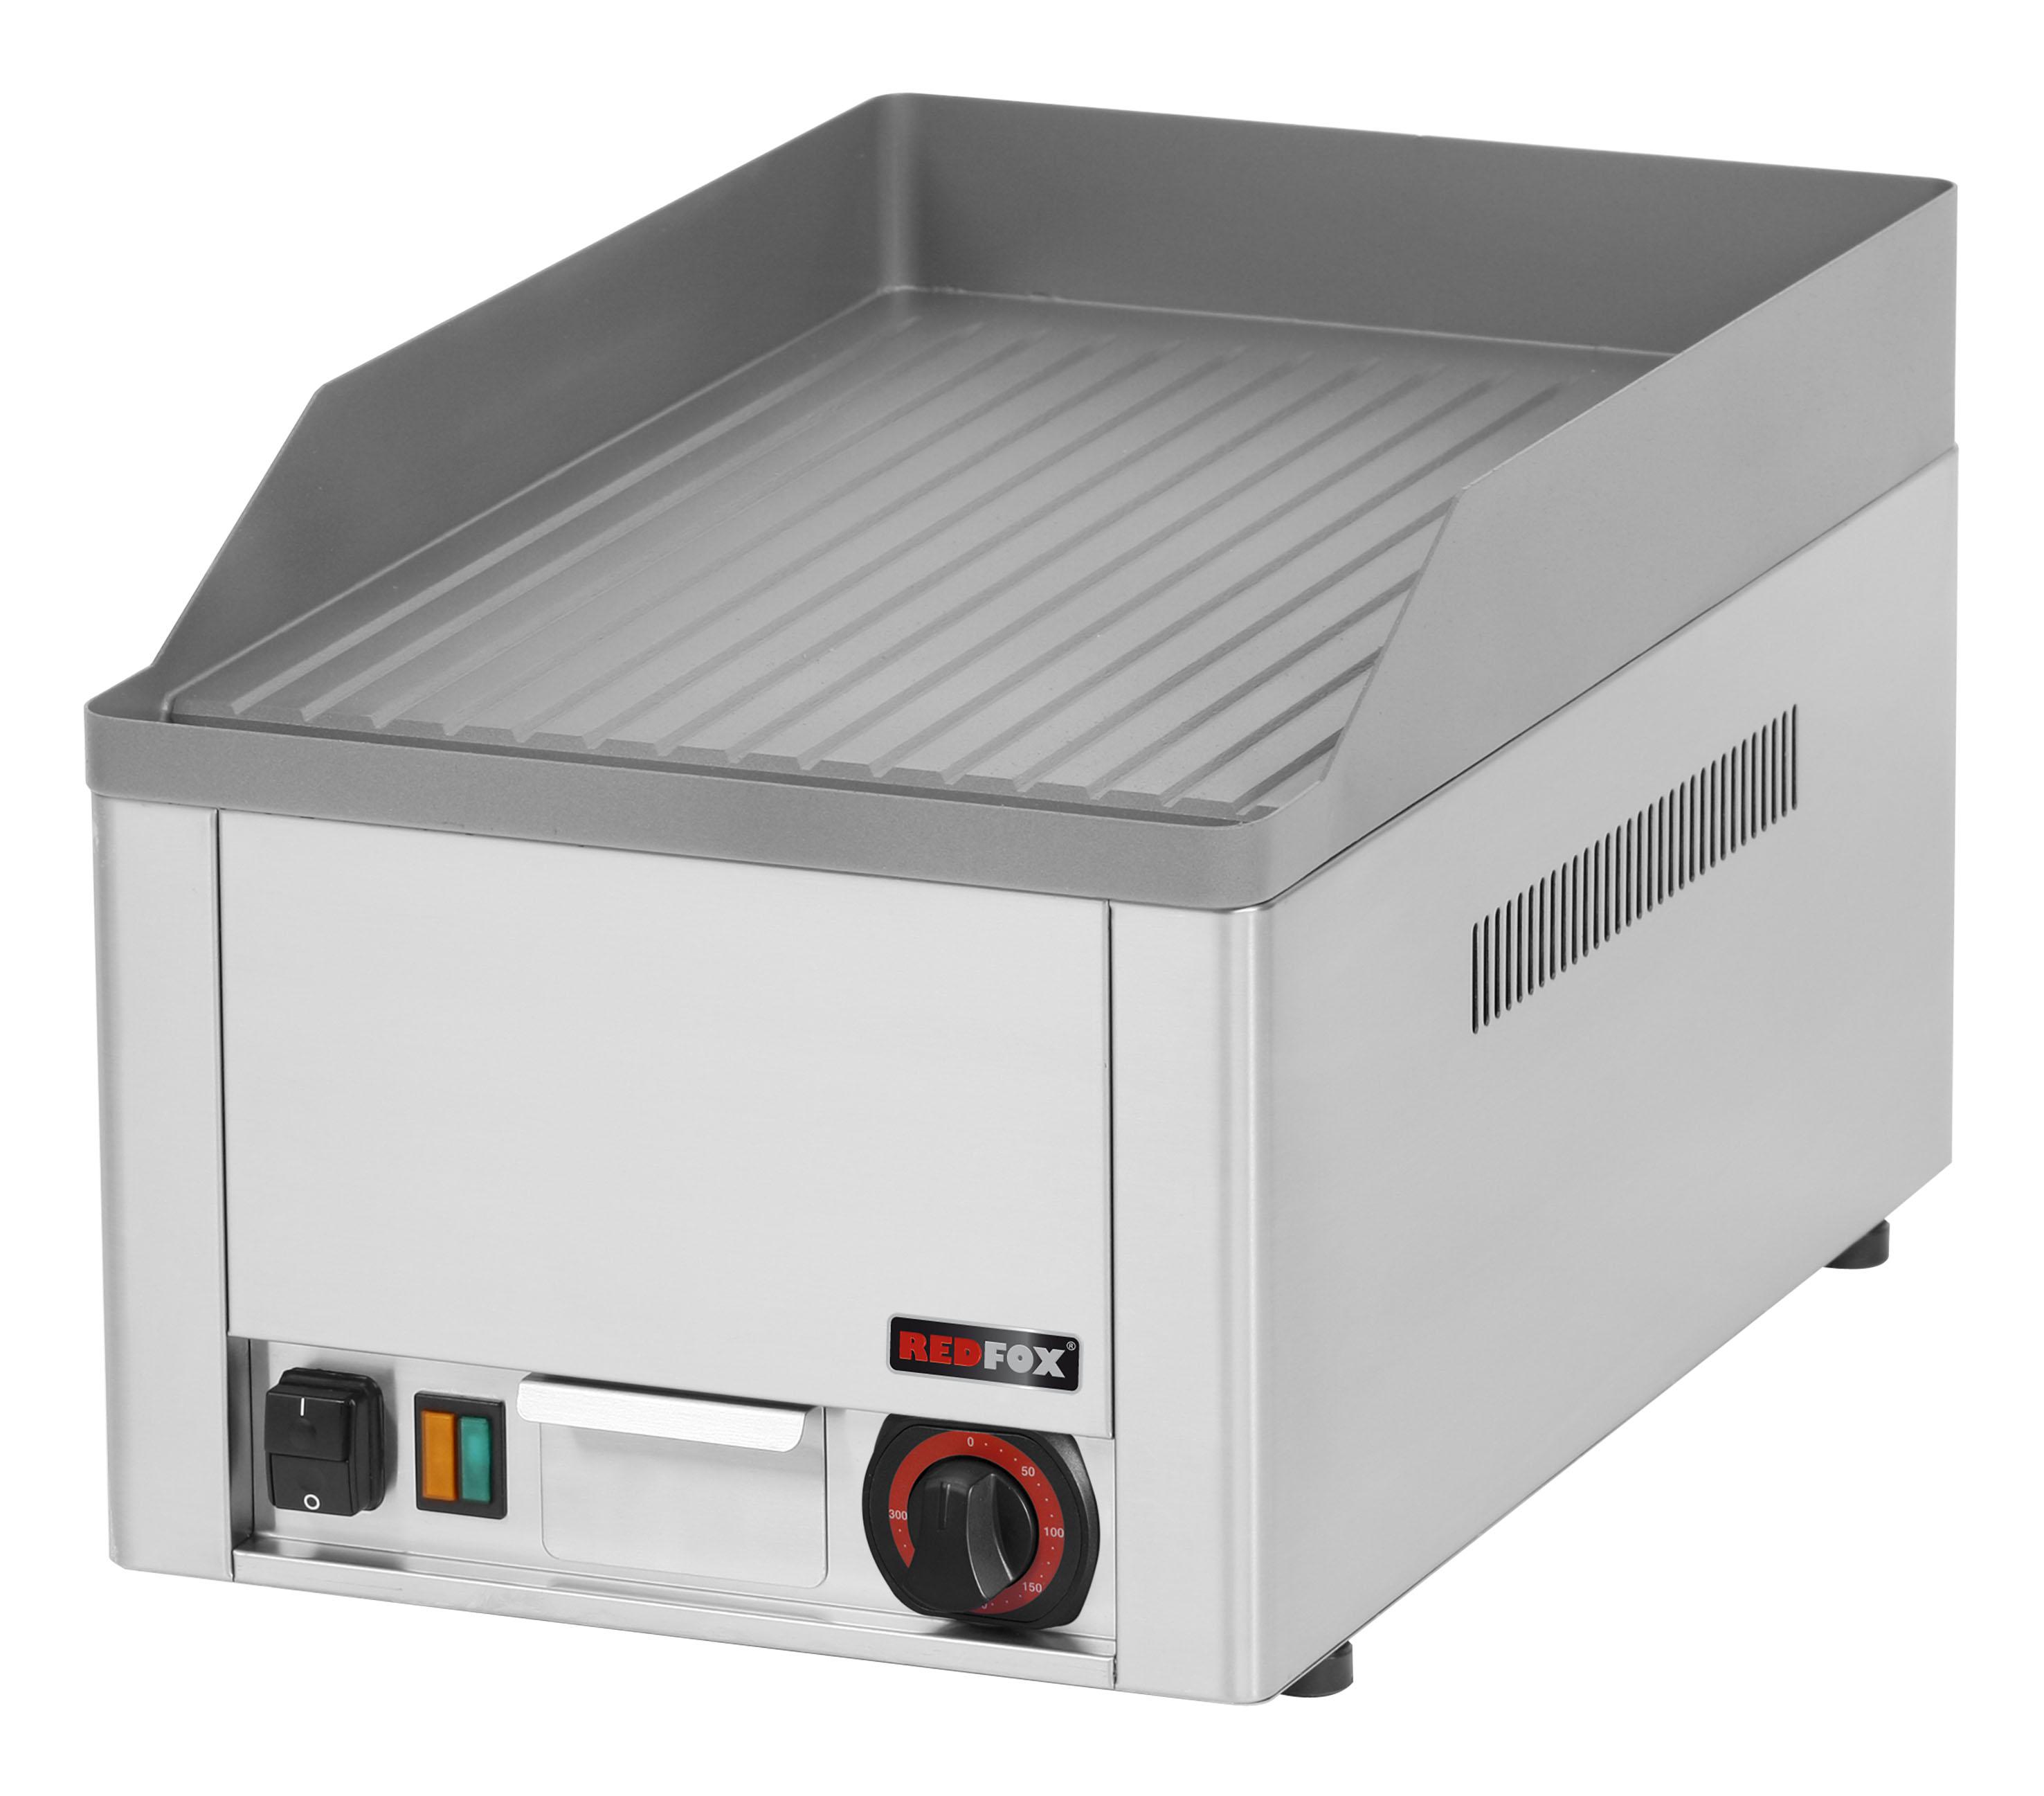 Deska grilovací elektrická FTR 30 E rýhovaná ocelová REDFOX